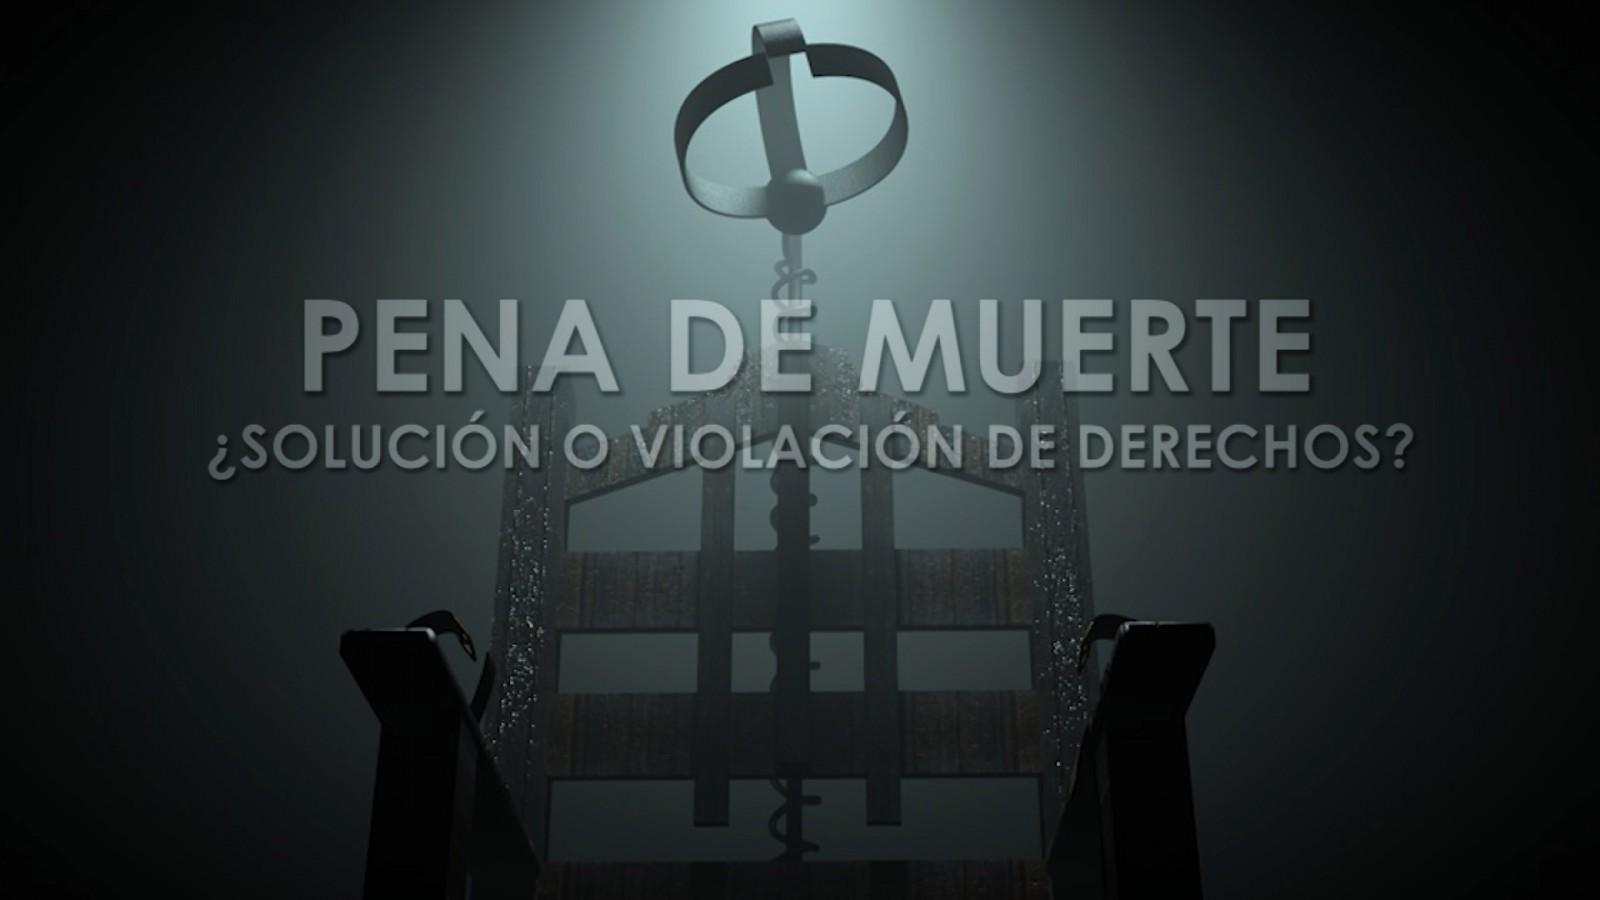 _pena_de_muerte_cam-mxf_-imagen-fija001